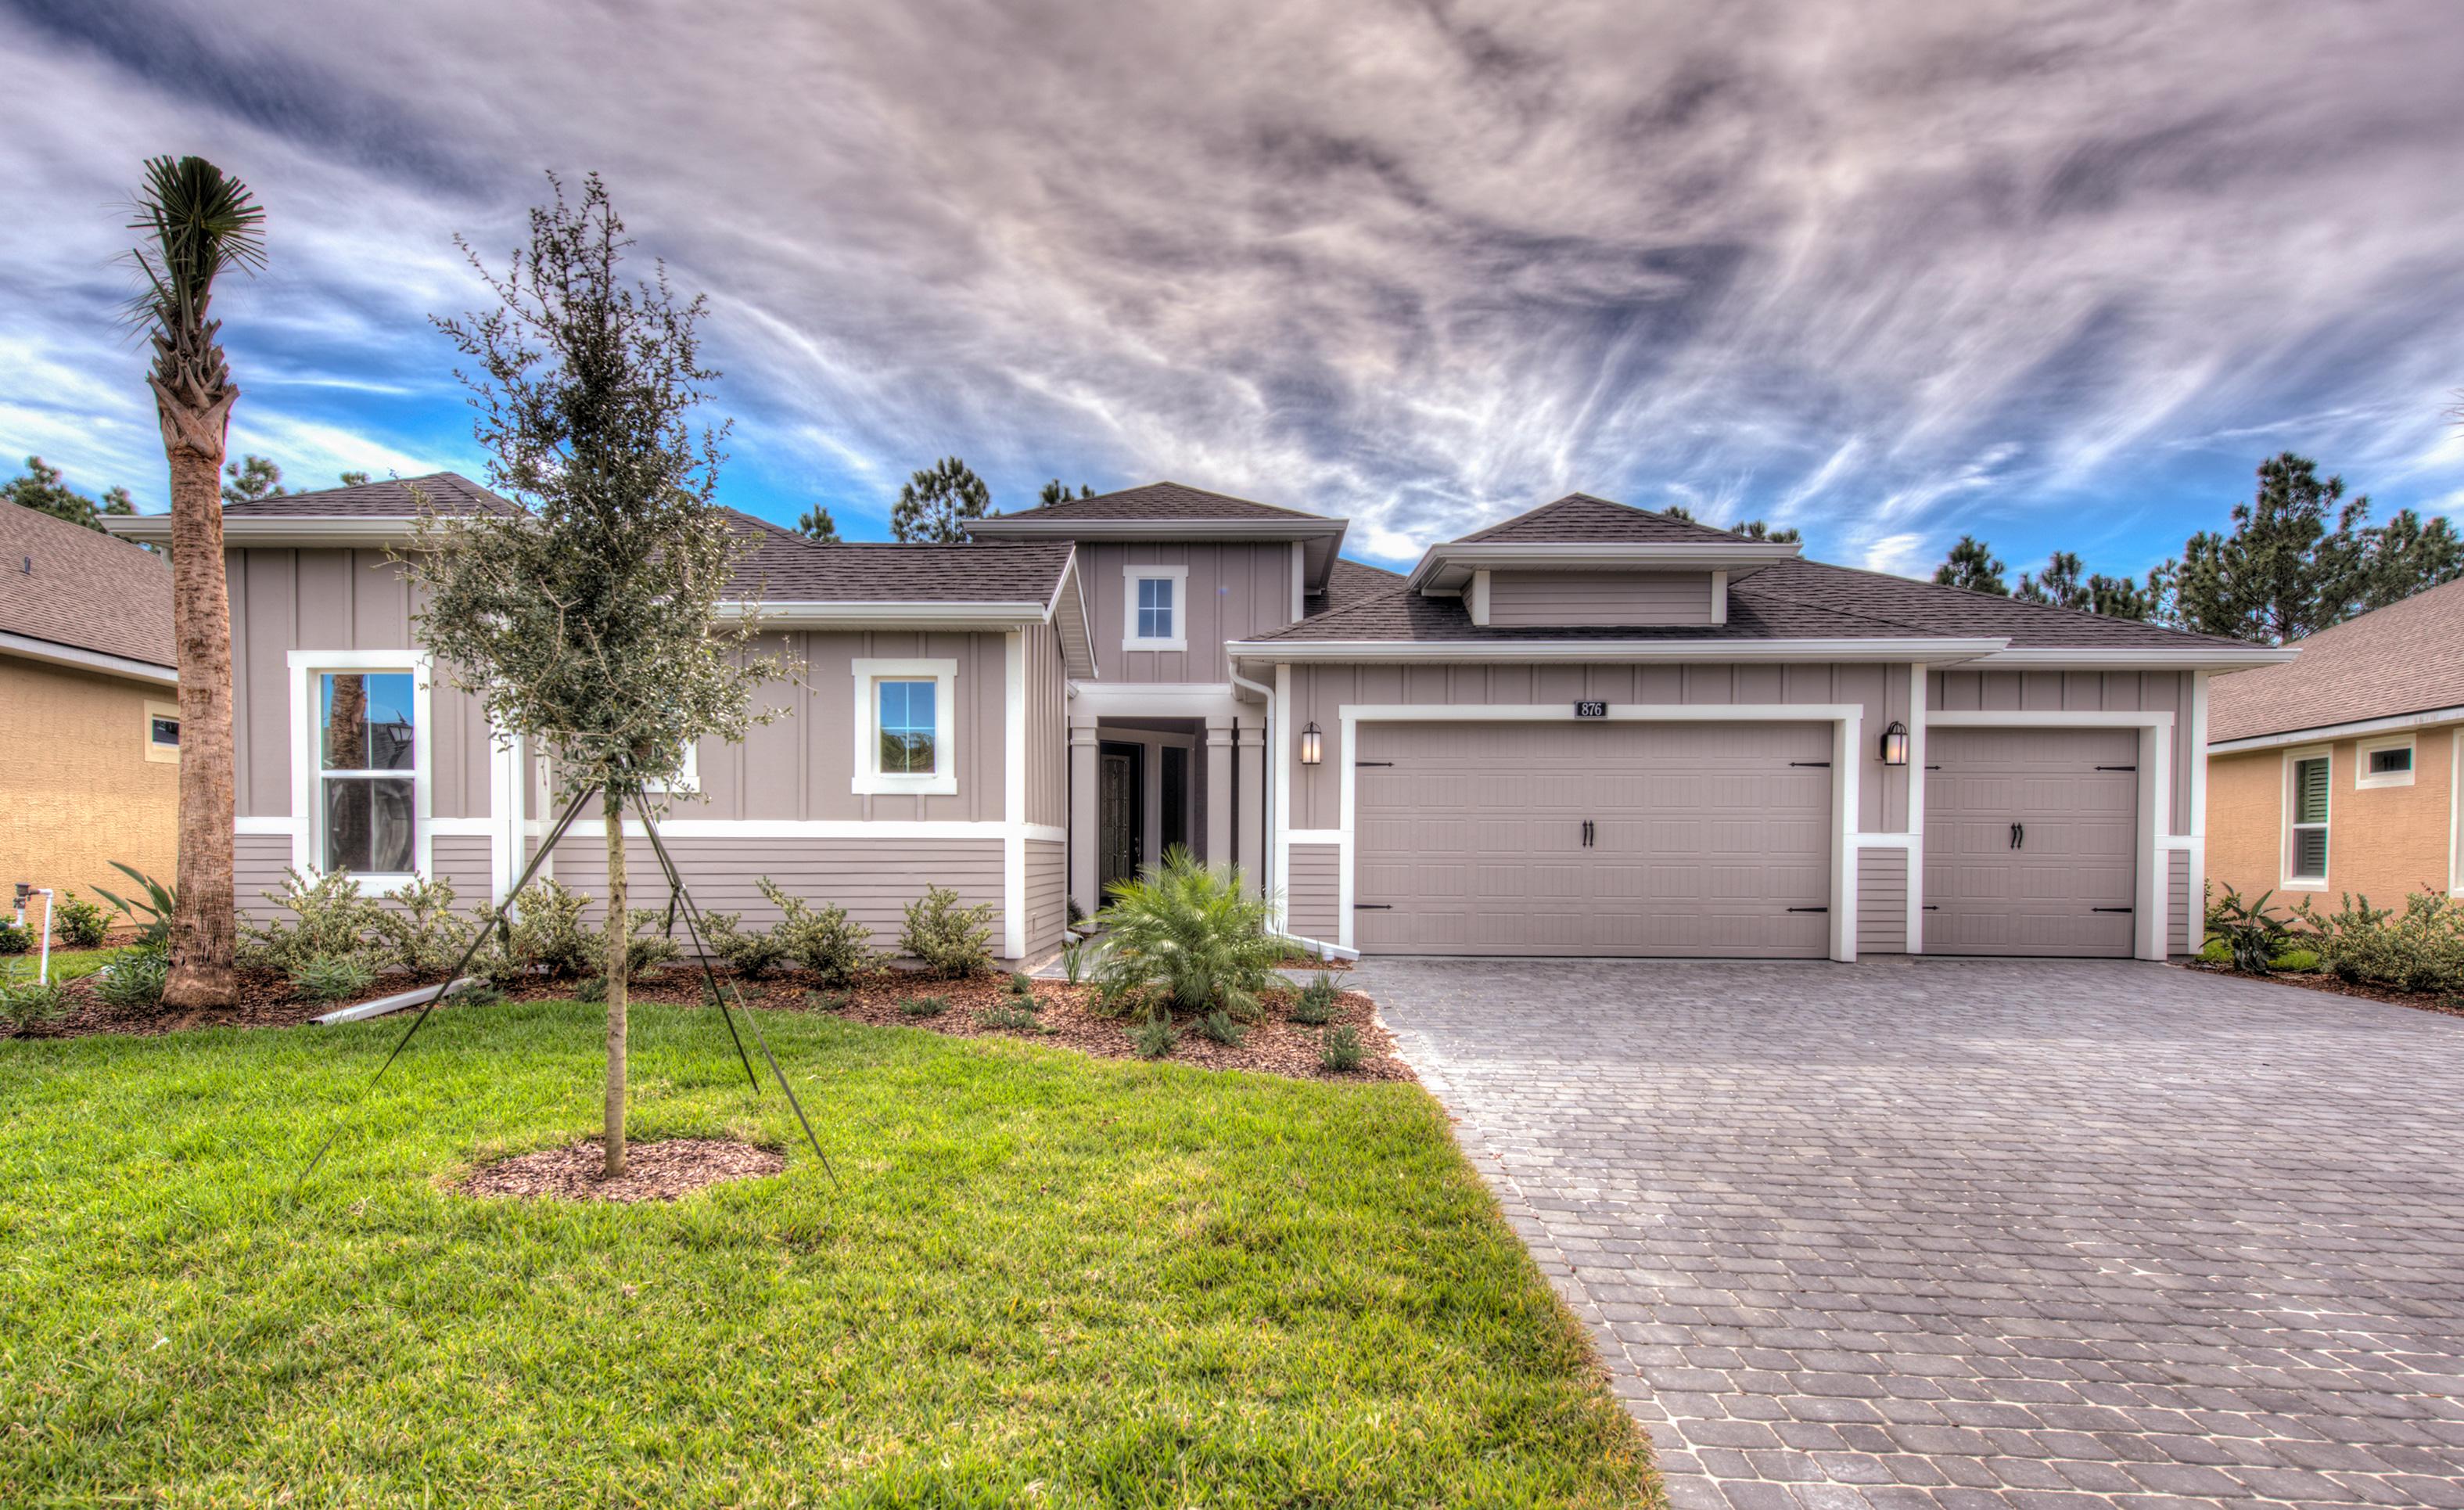 876 Creekwood Drive, Ormond Beach, FL 32174